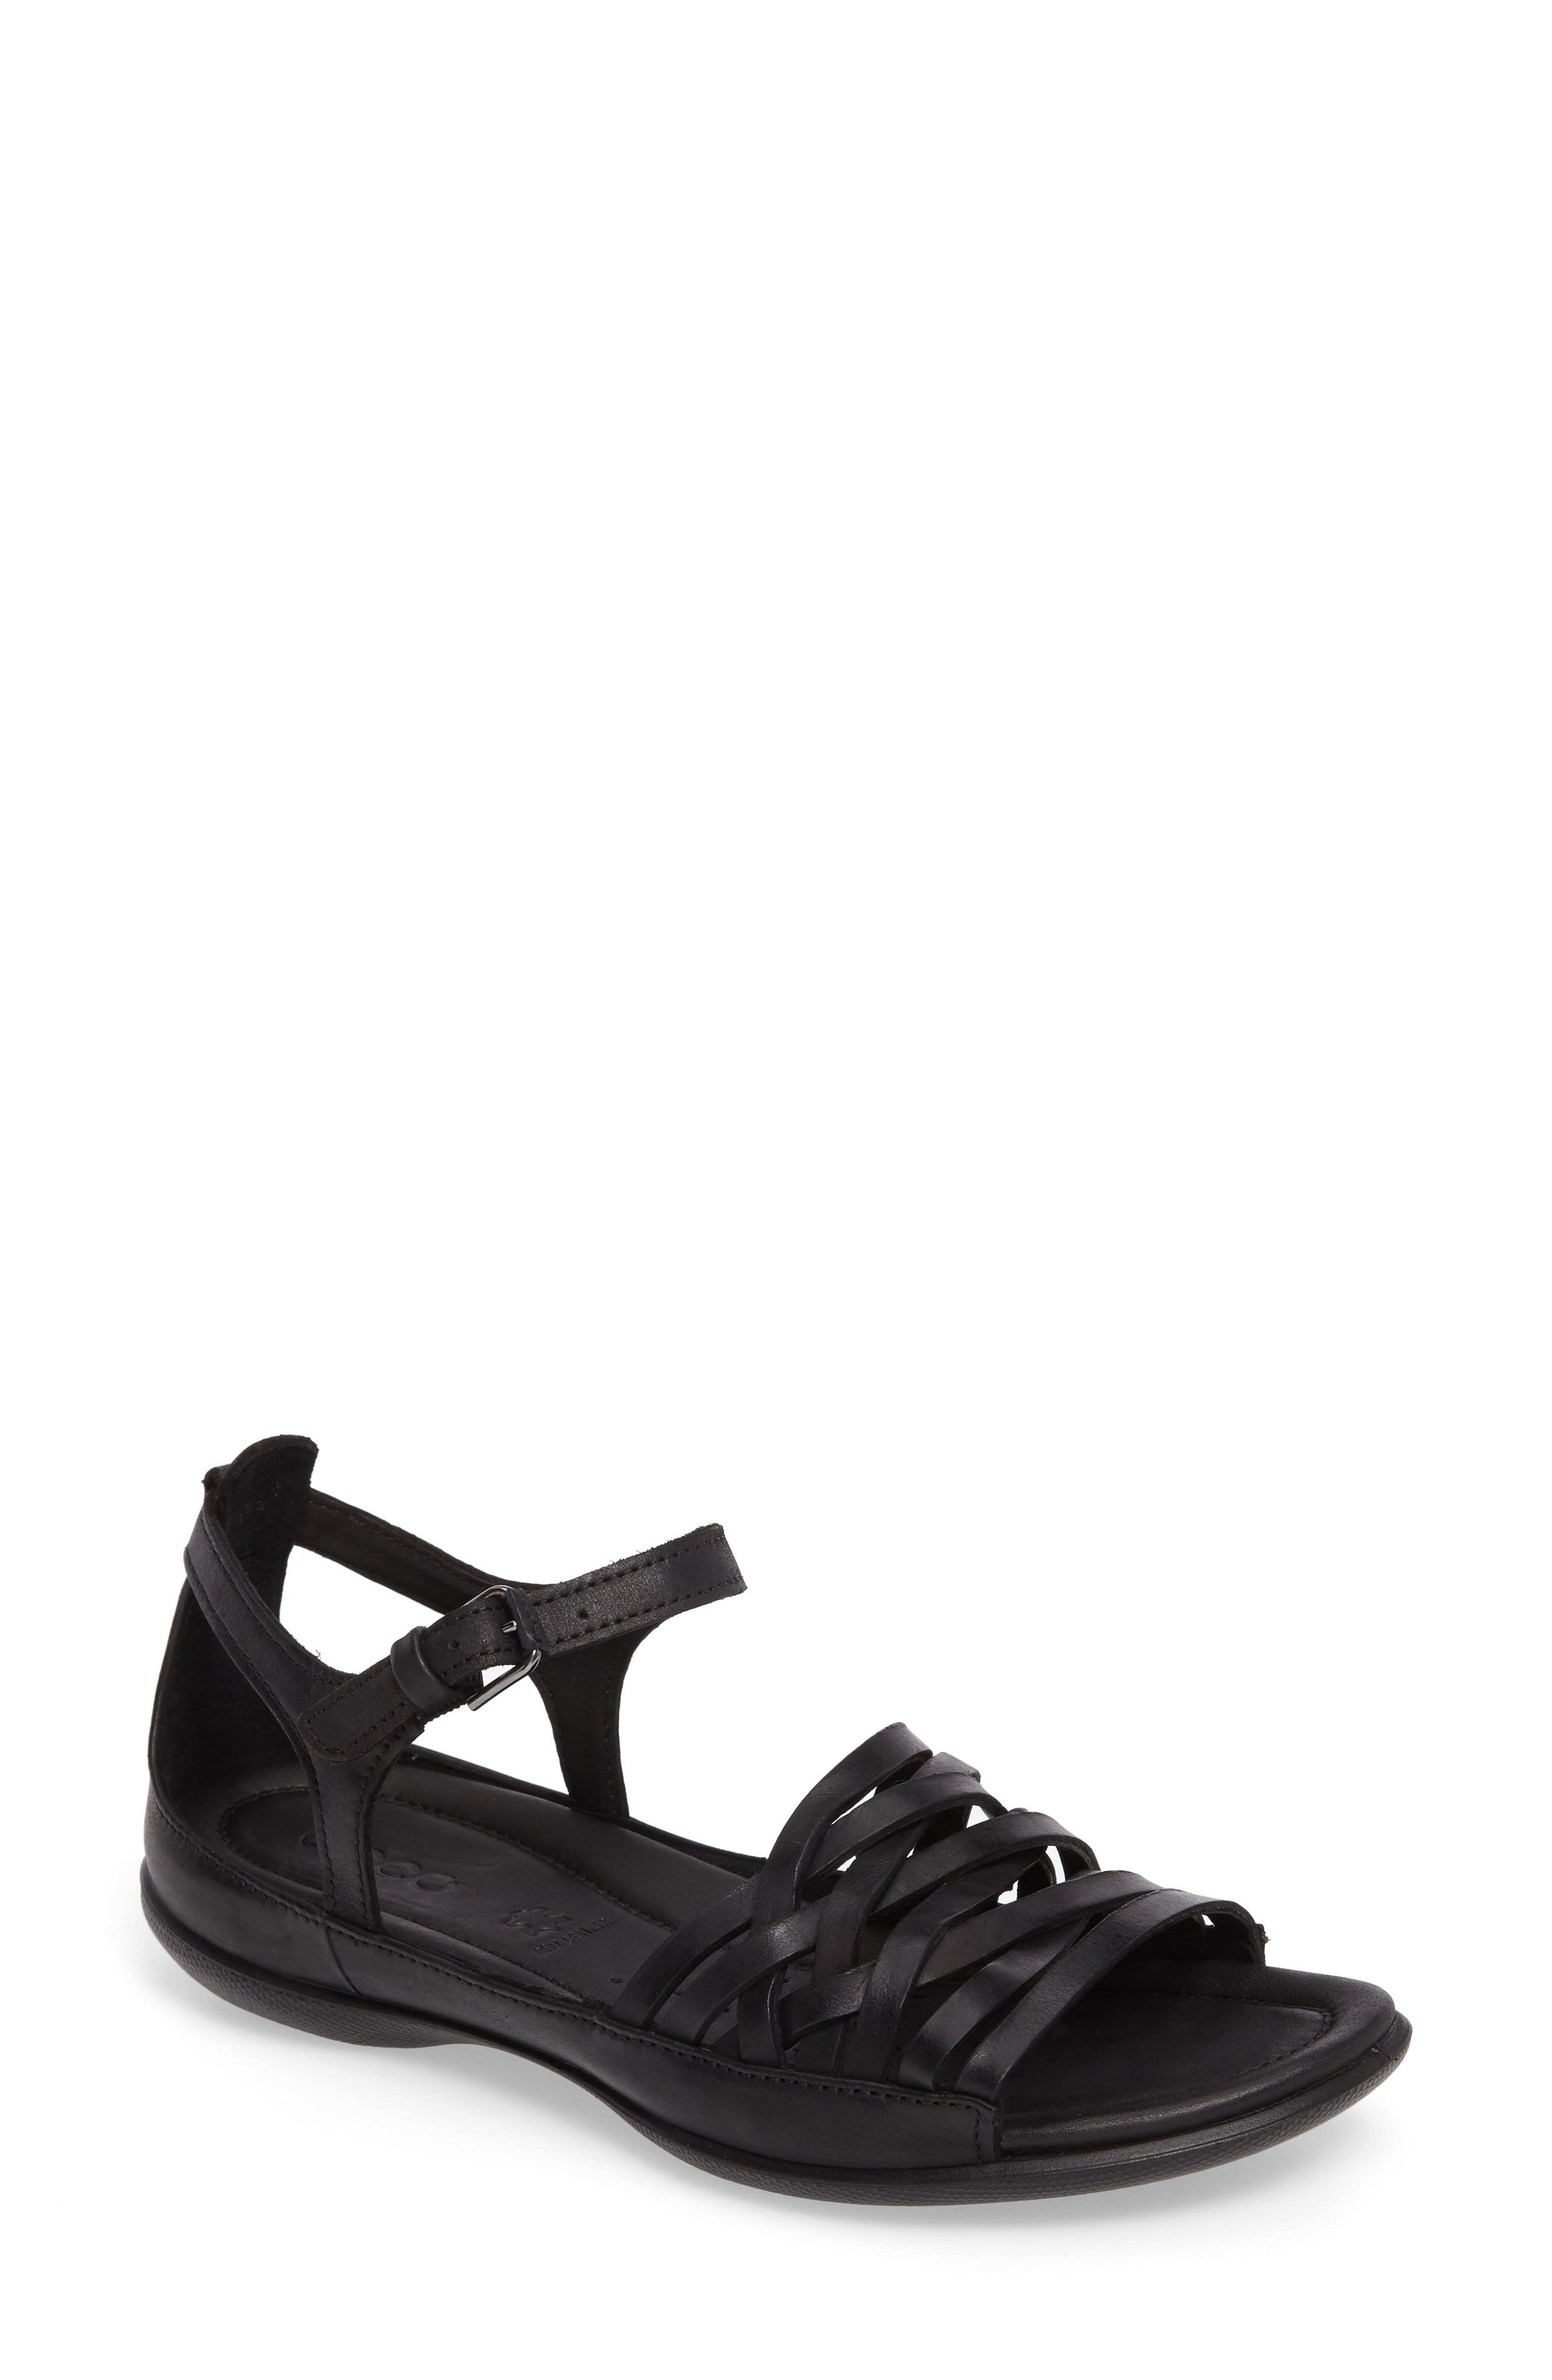 Flash Sandal,                         Main,                         color, Black Leather